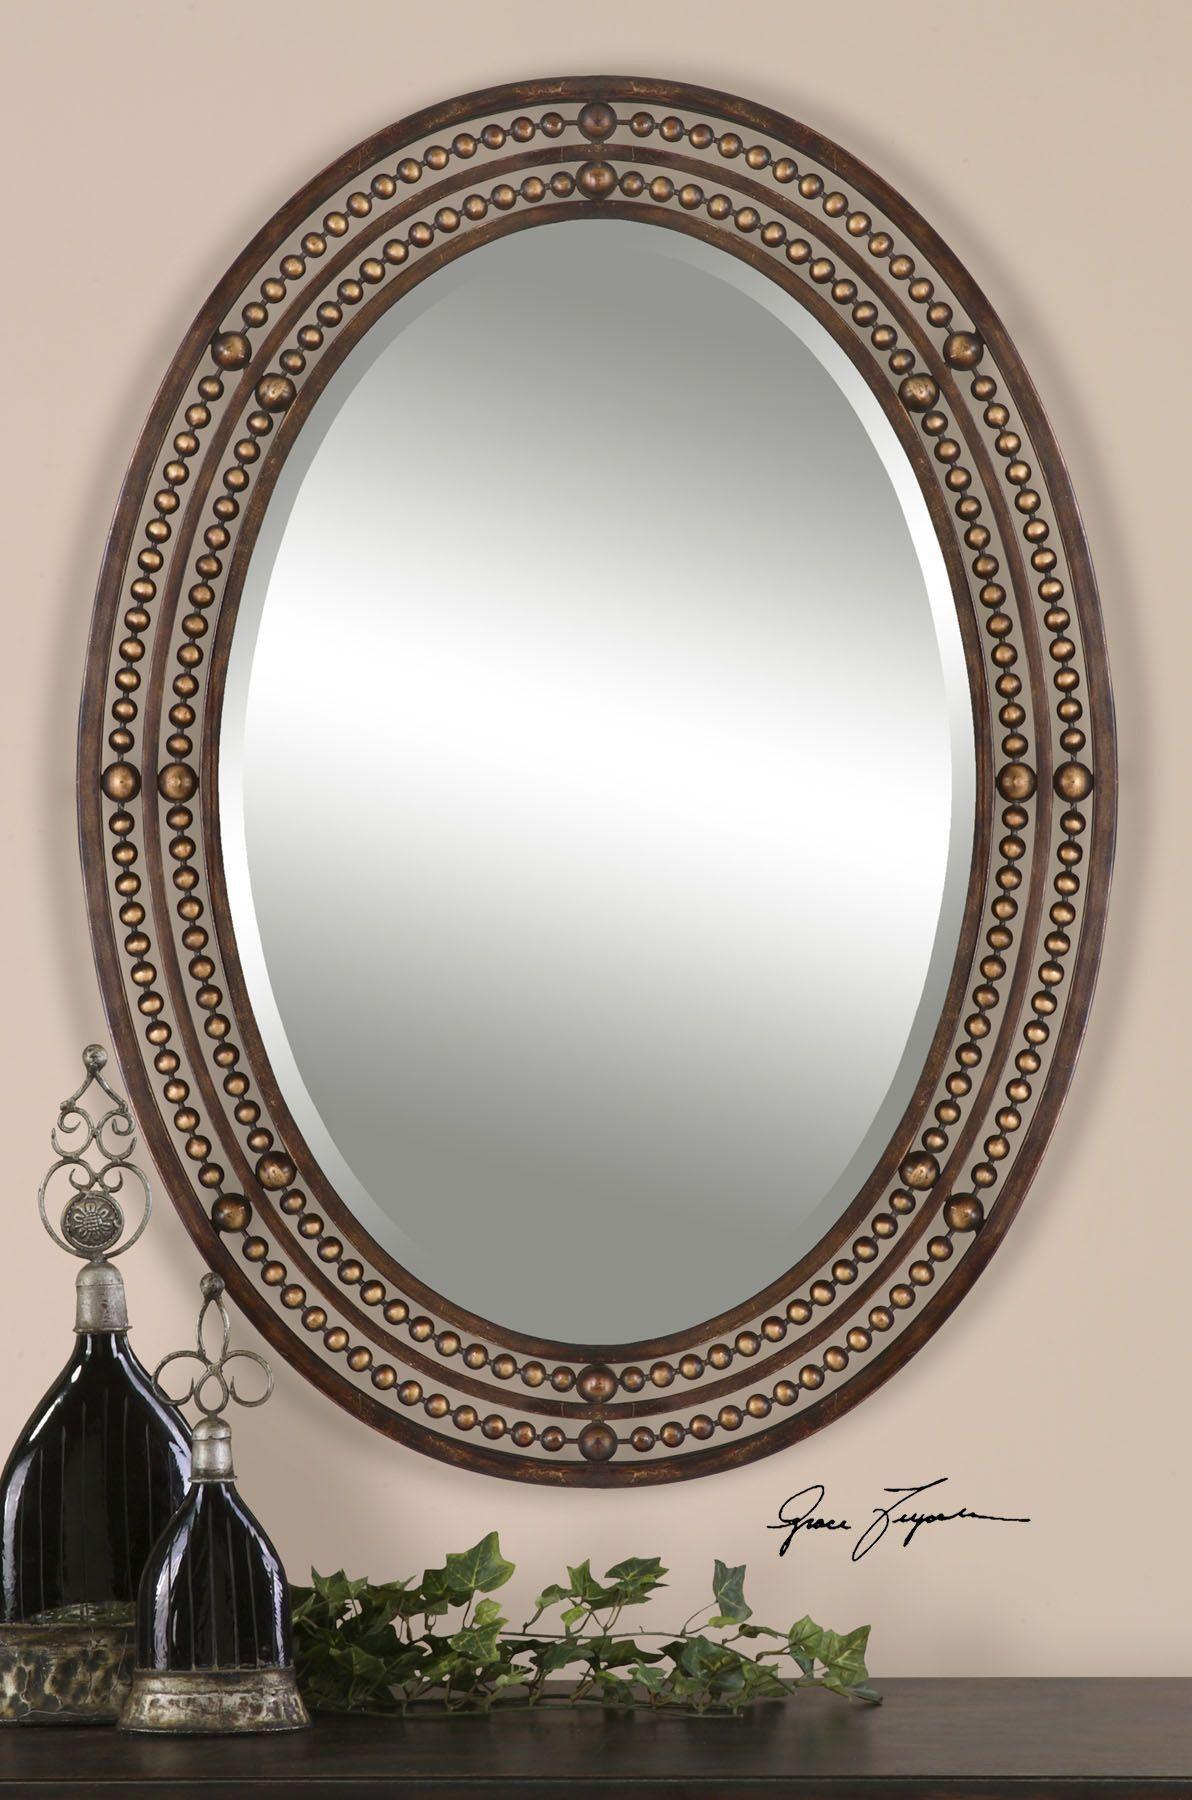 Matney Distressed Bronze Mirror Mirror wall